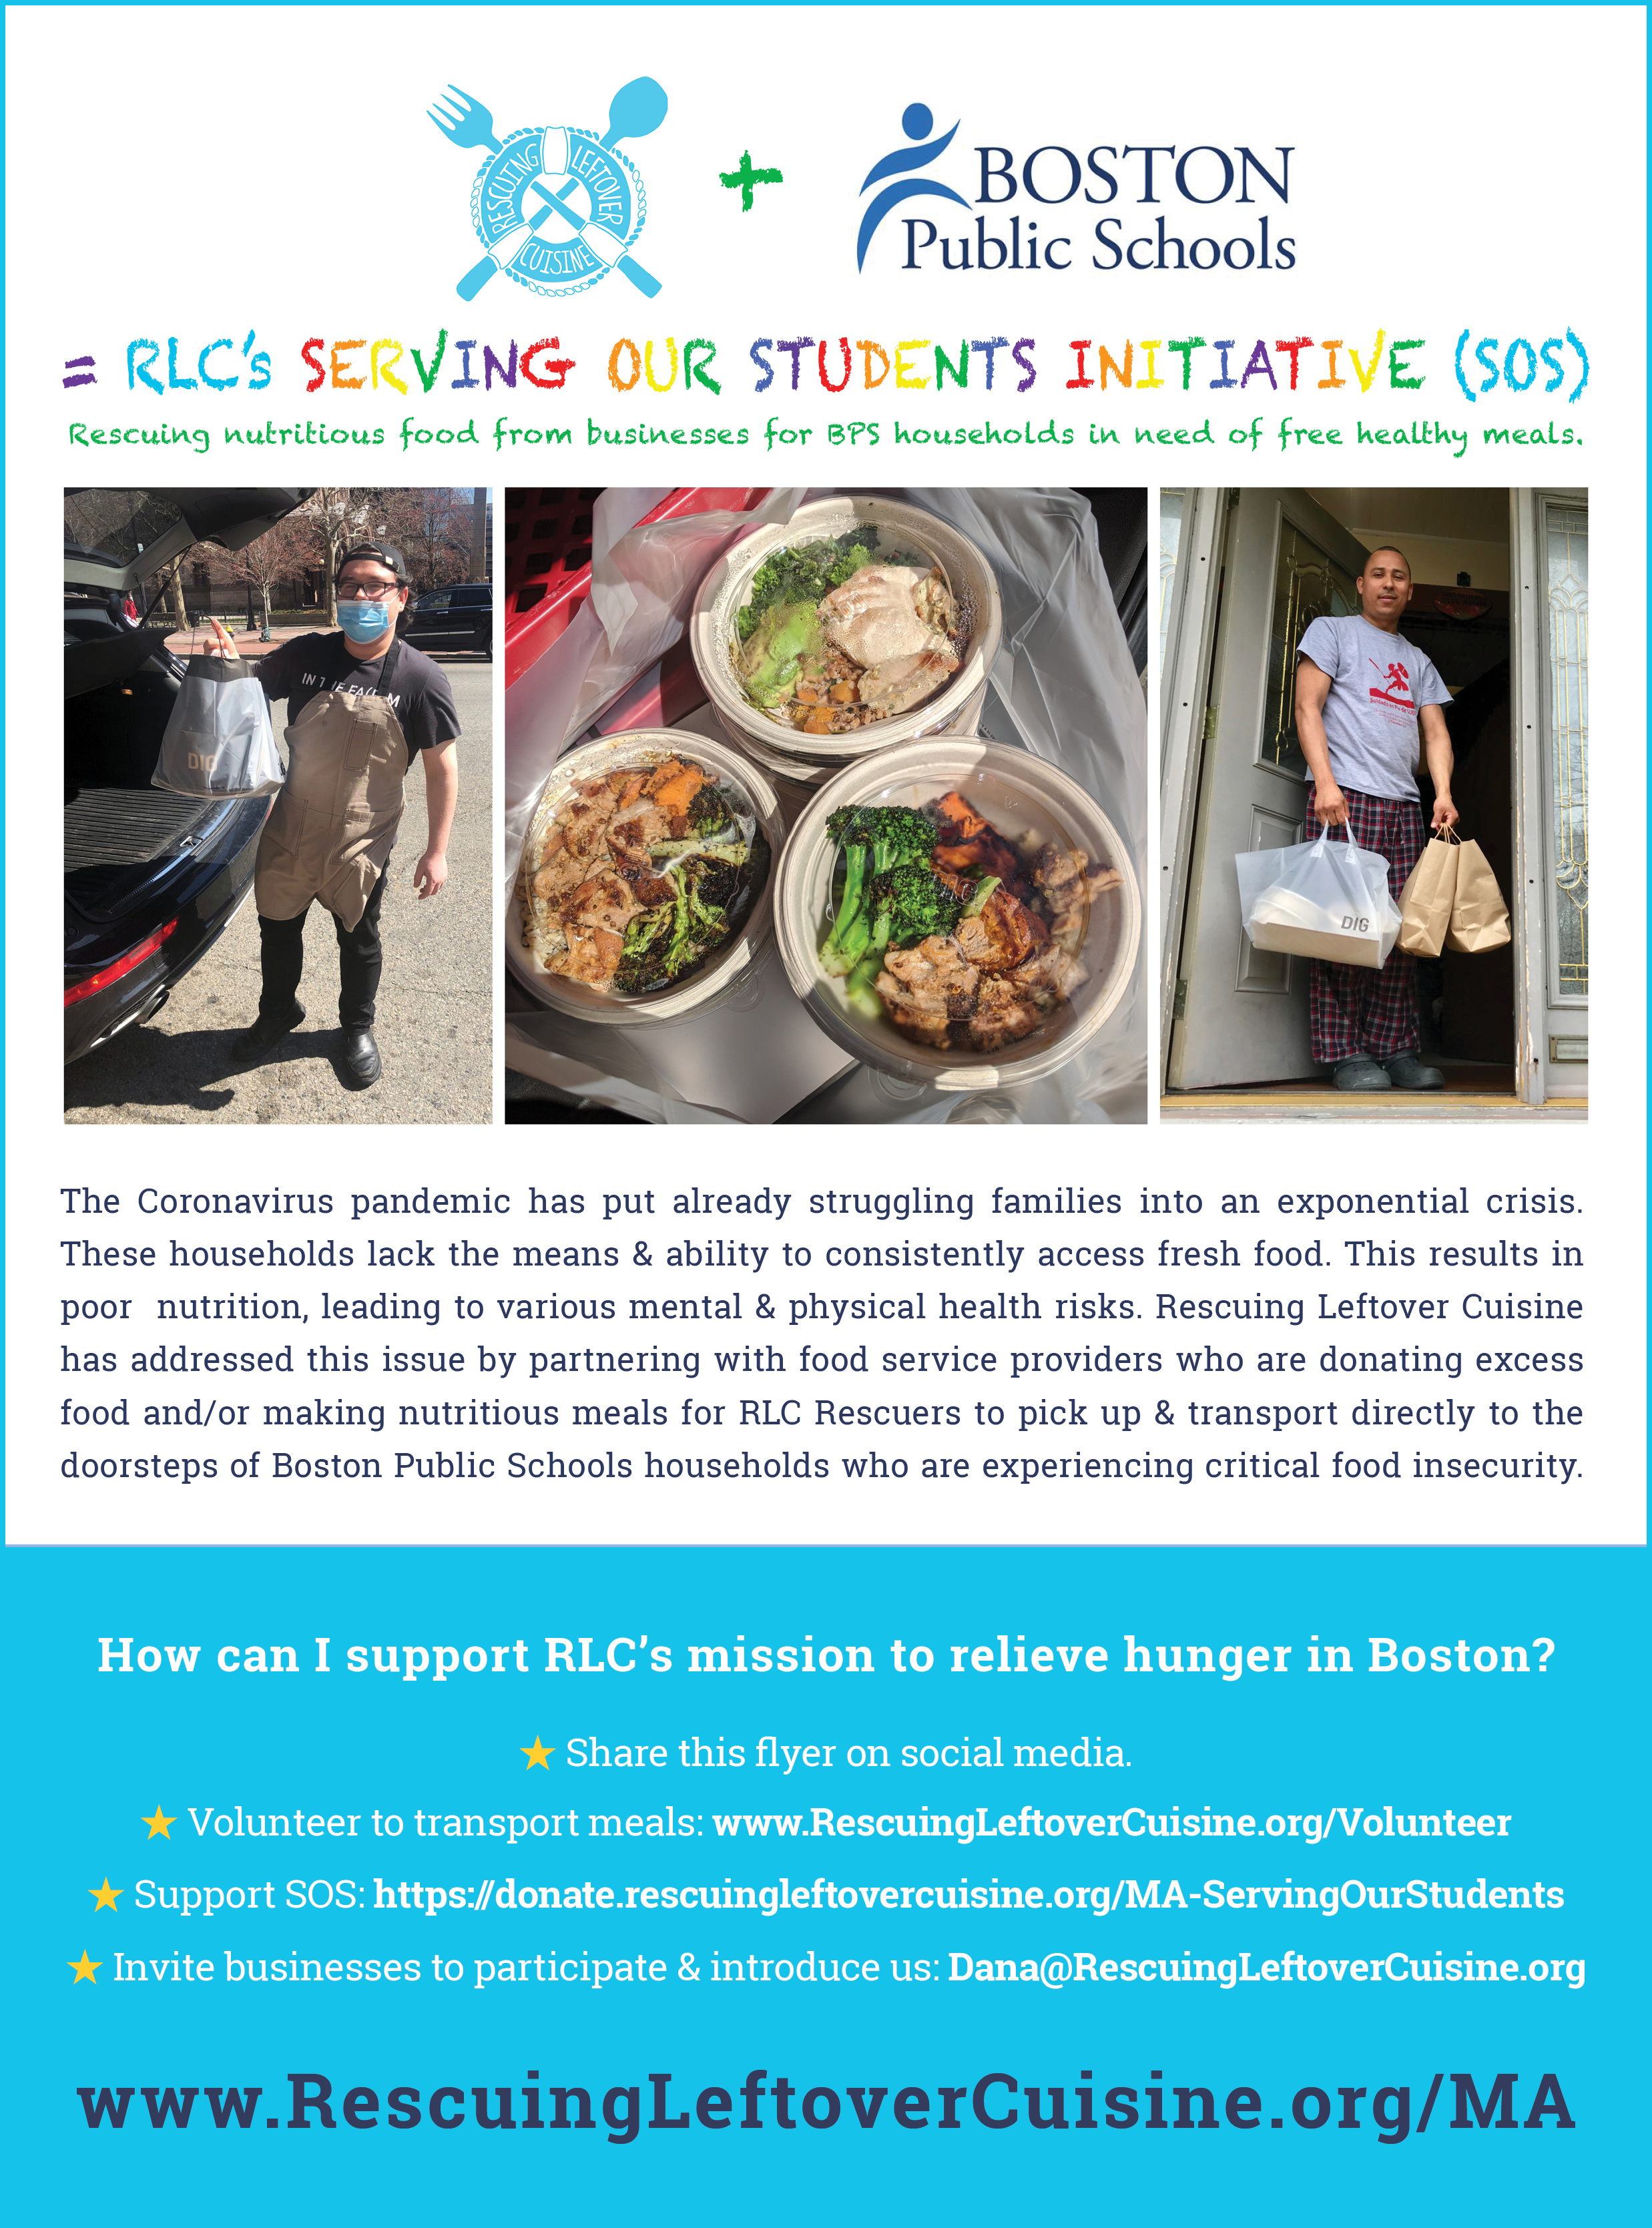 Community Service Organization - Rescuing Leftover Cuisine Massachusetts  2